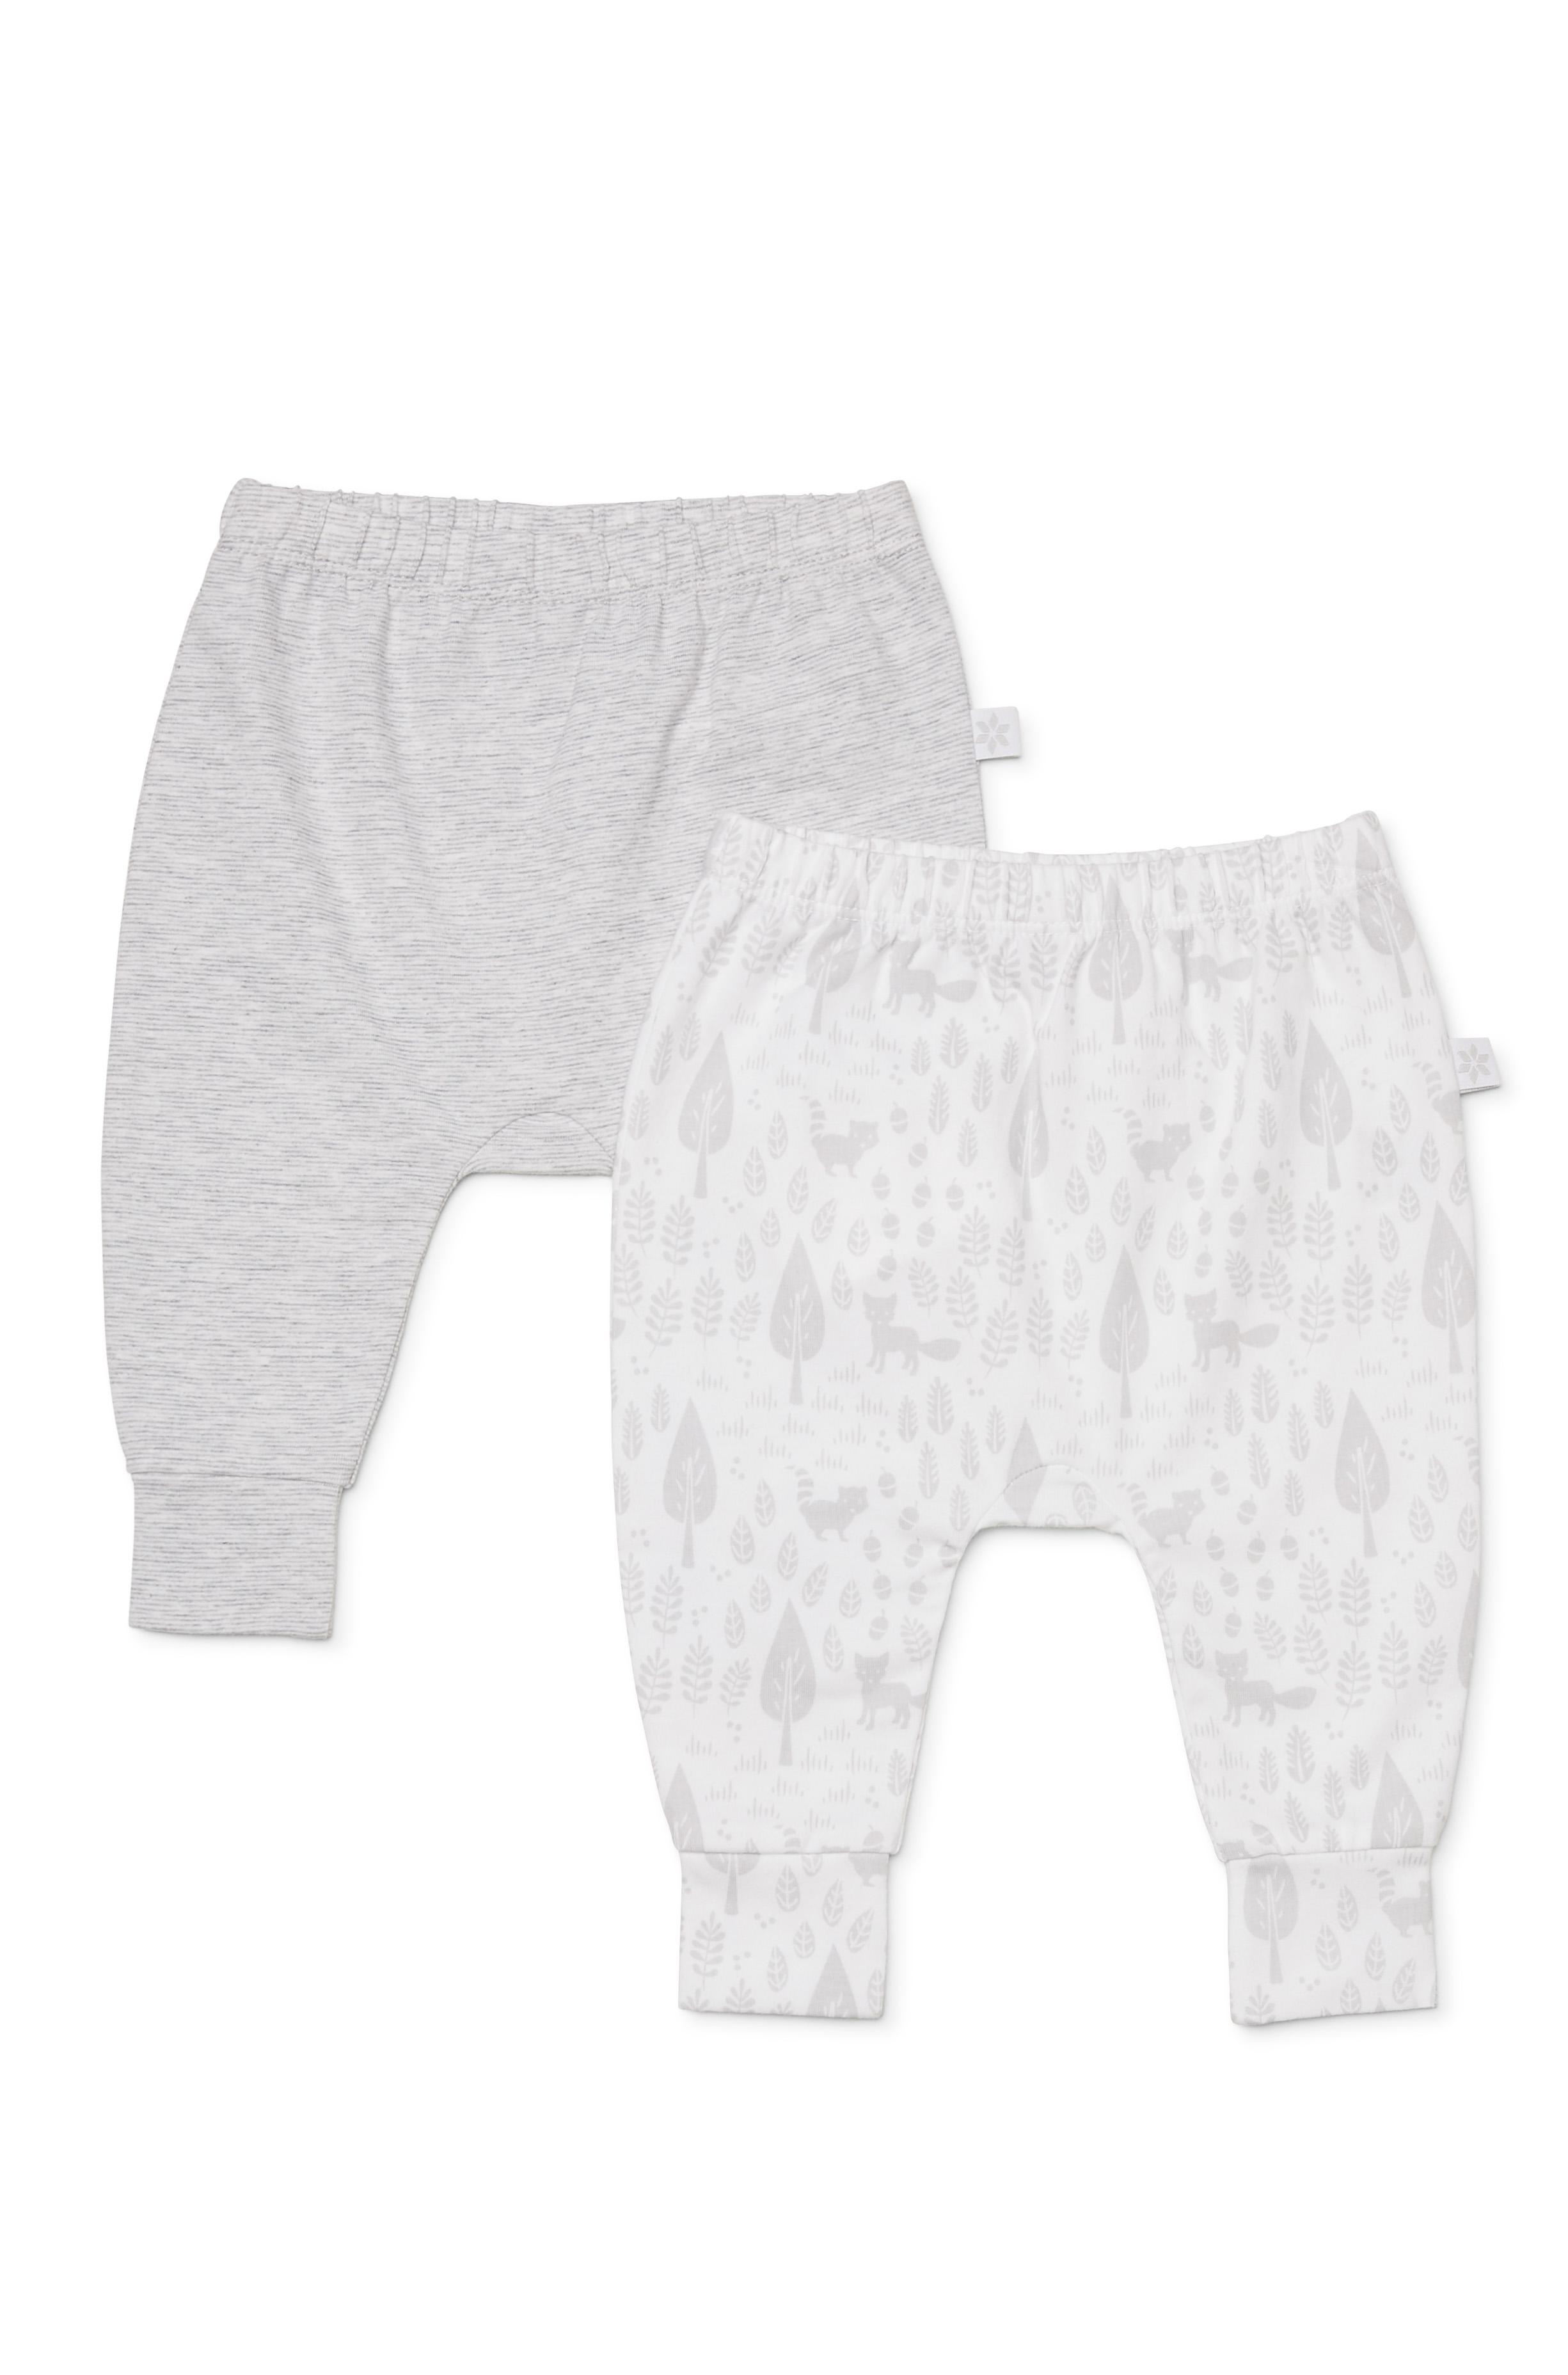 Marquise Grey Stripe Print Leggings 2 Pack